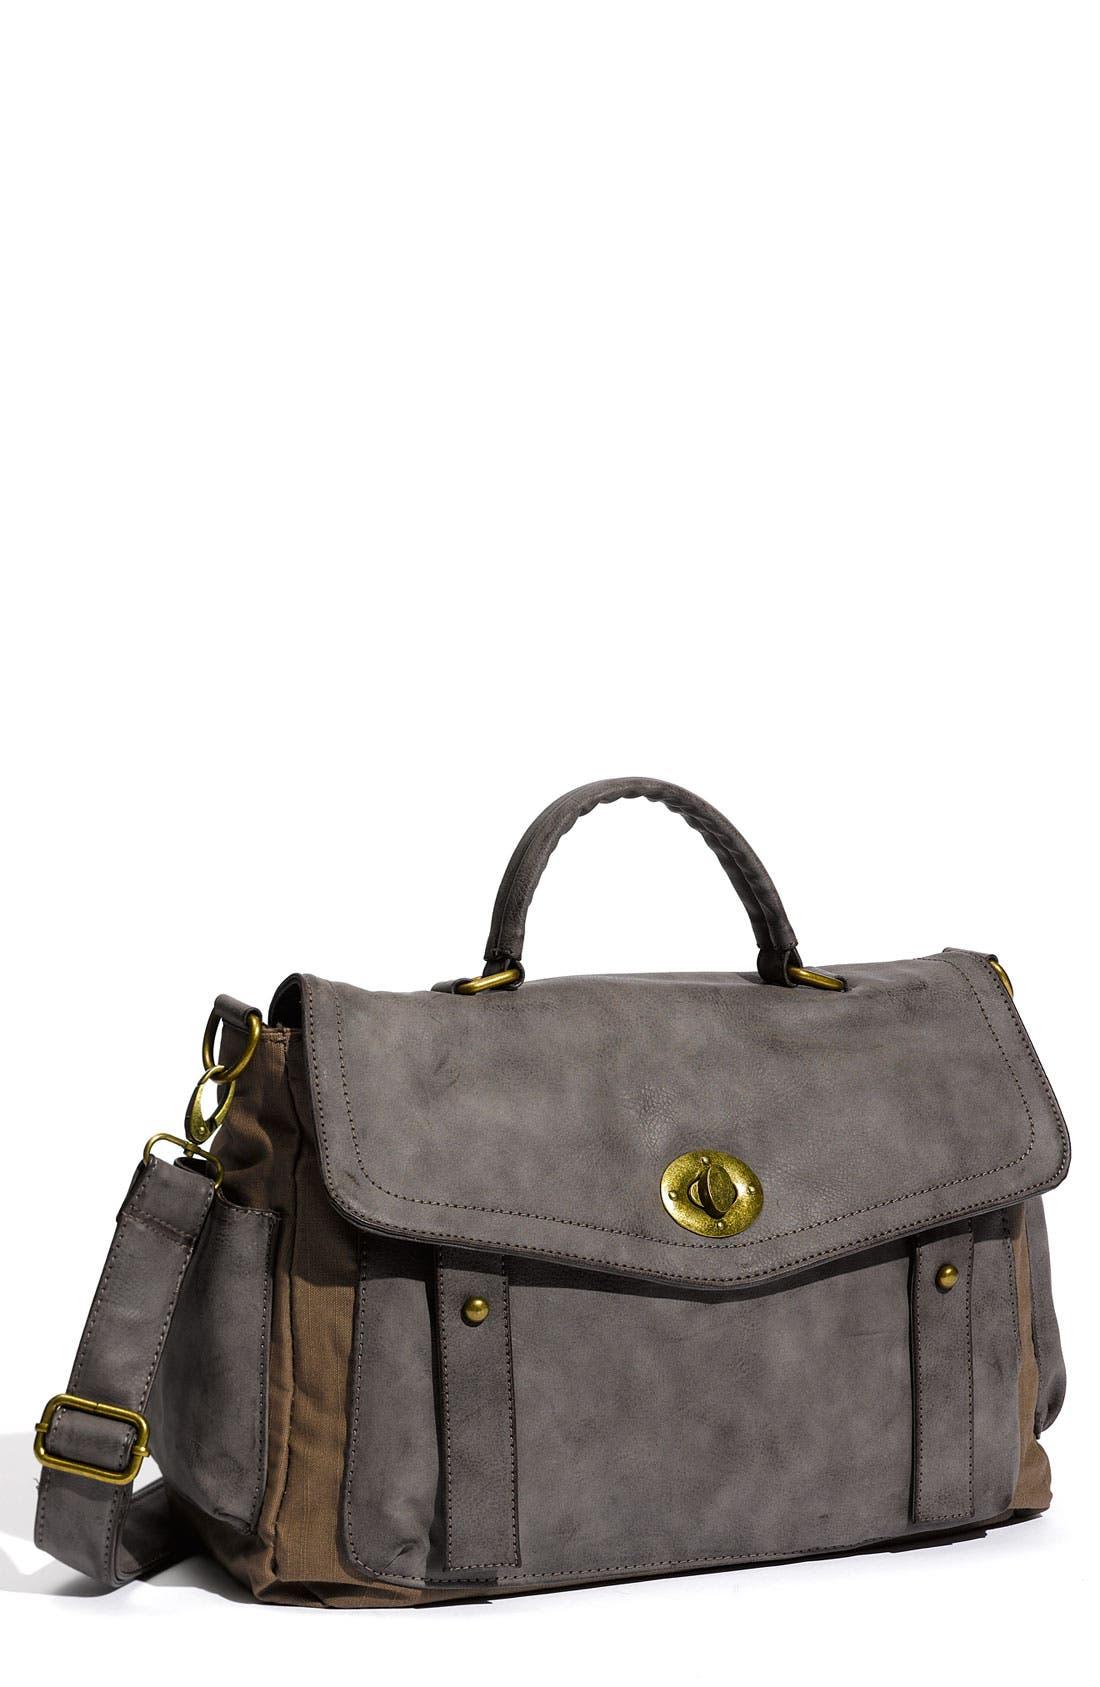 Main Image - Cesca Vintage Weathered Faux Leather Satchel